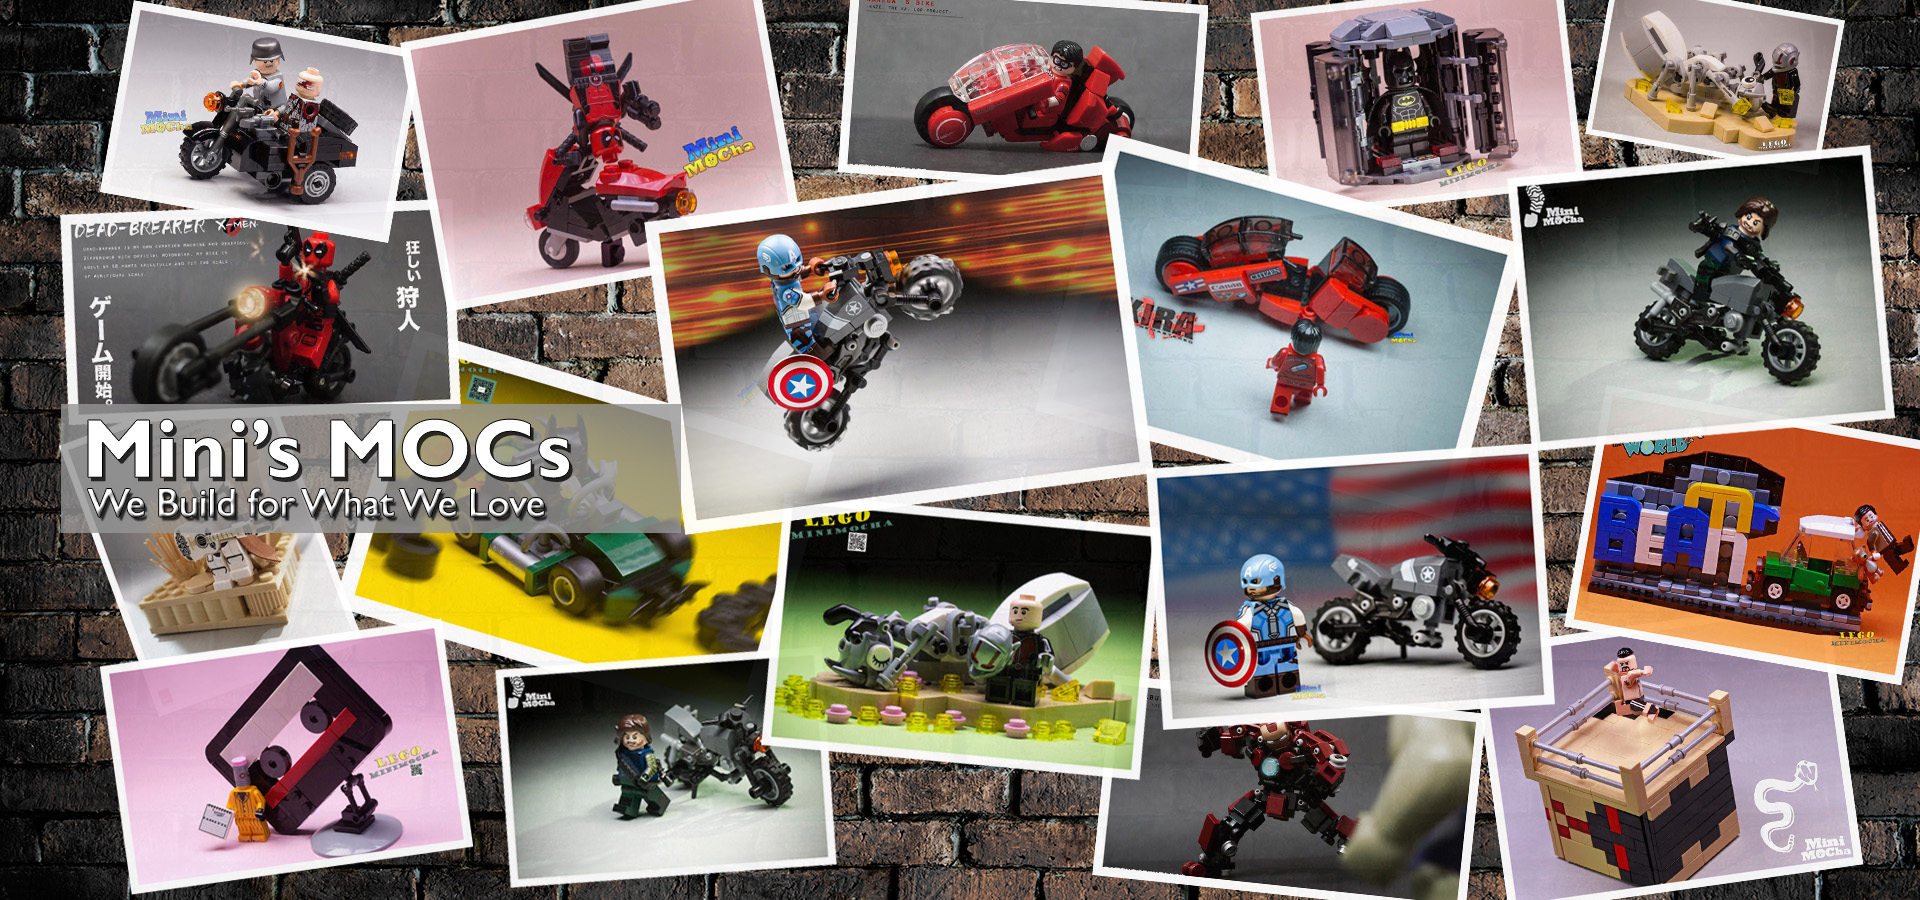 MiniMOCha - Custom Limited LEGO Minifigures, LEGO MOC and Preorder